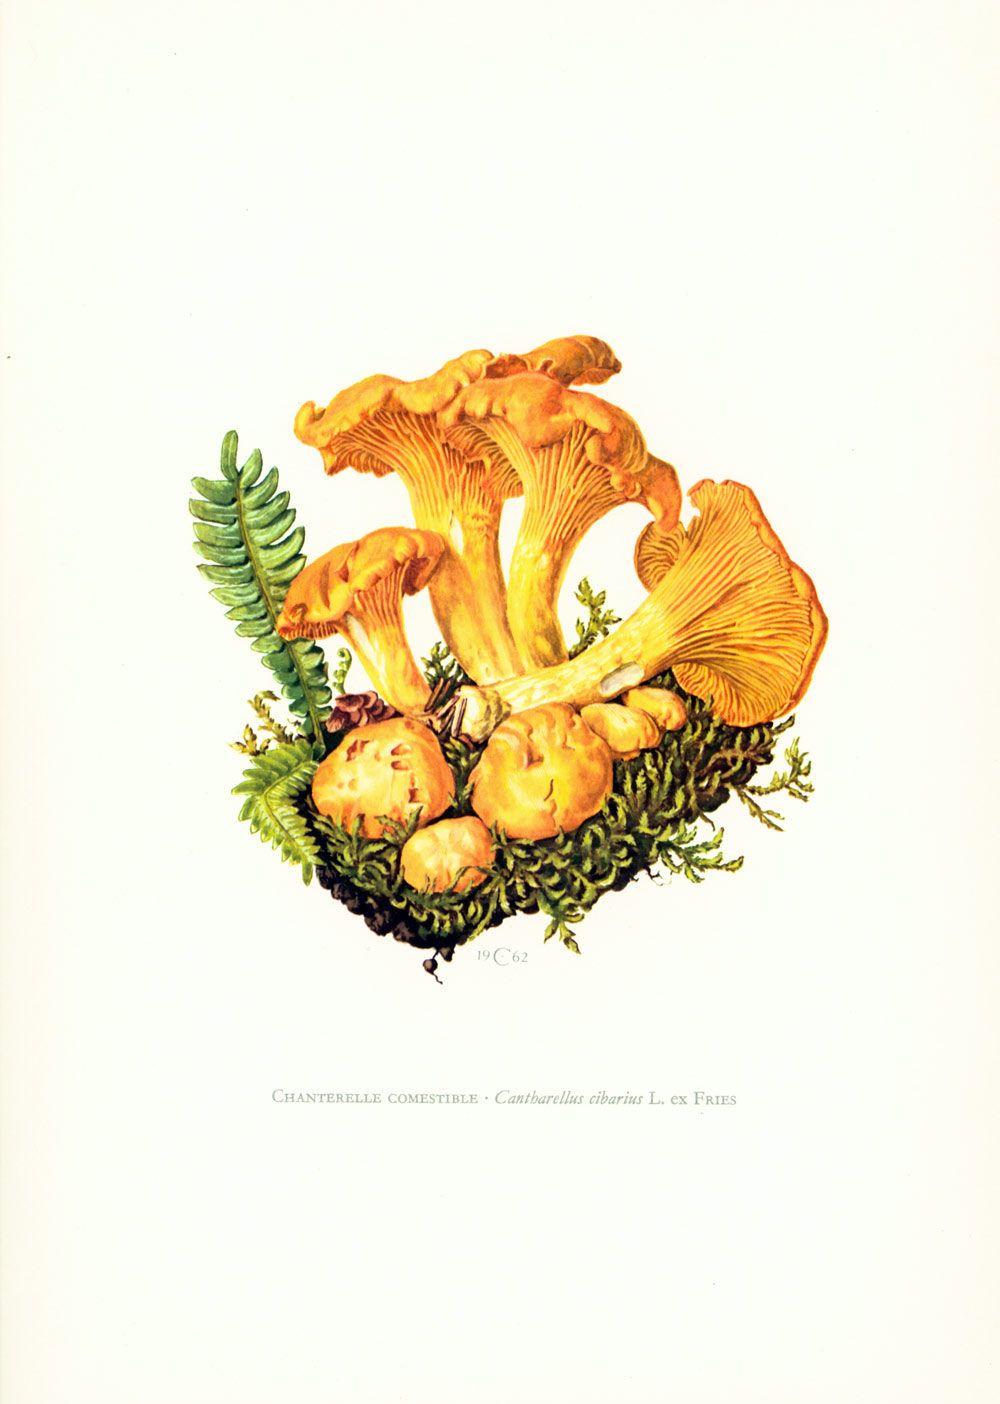 1962 Golden Chanterelle - Cantharellus cibarius Mushroom print ...